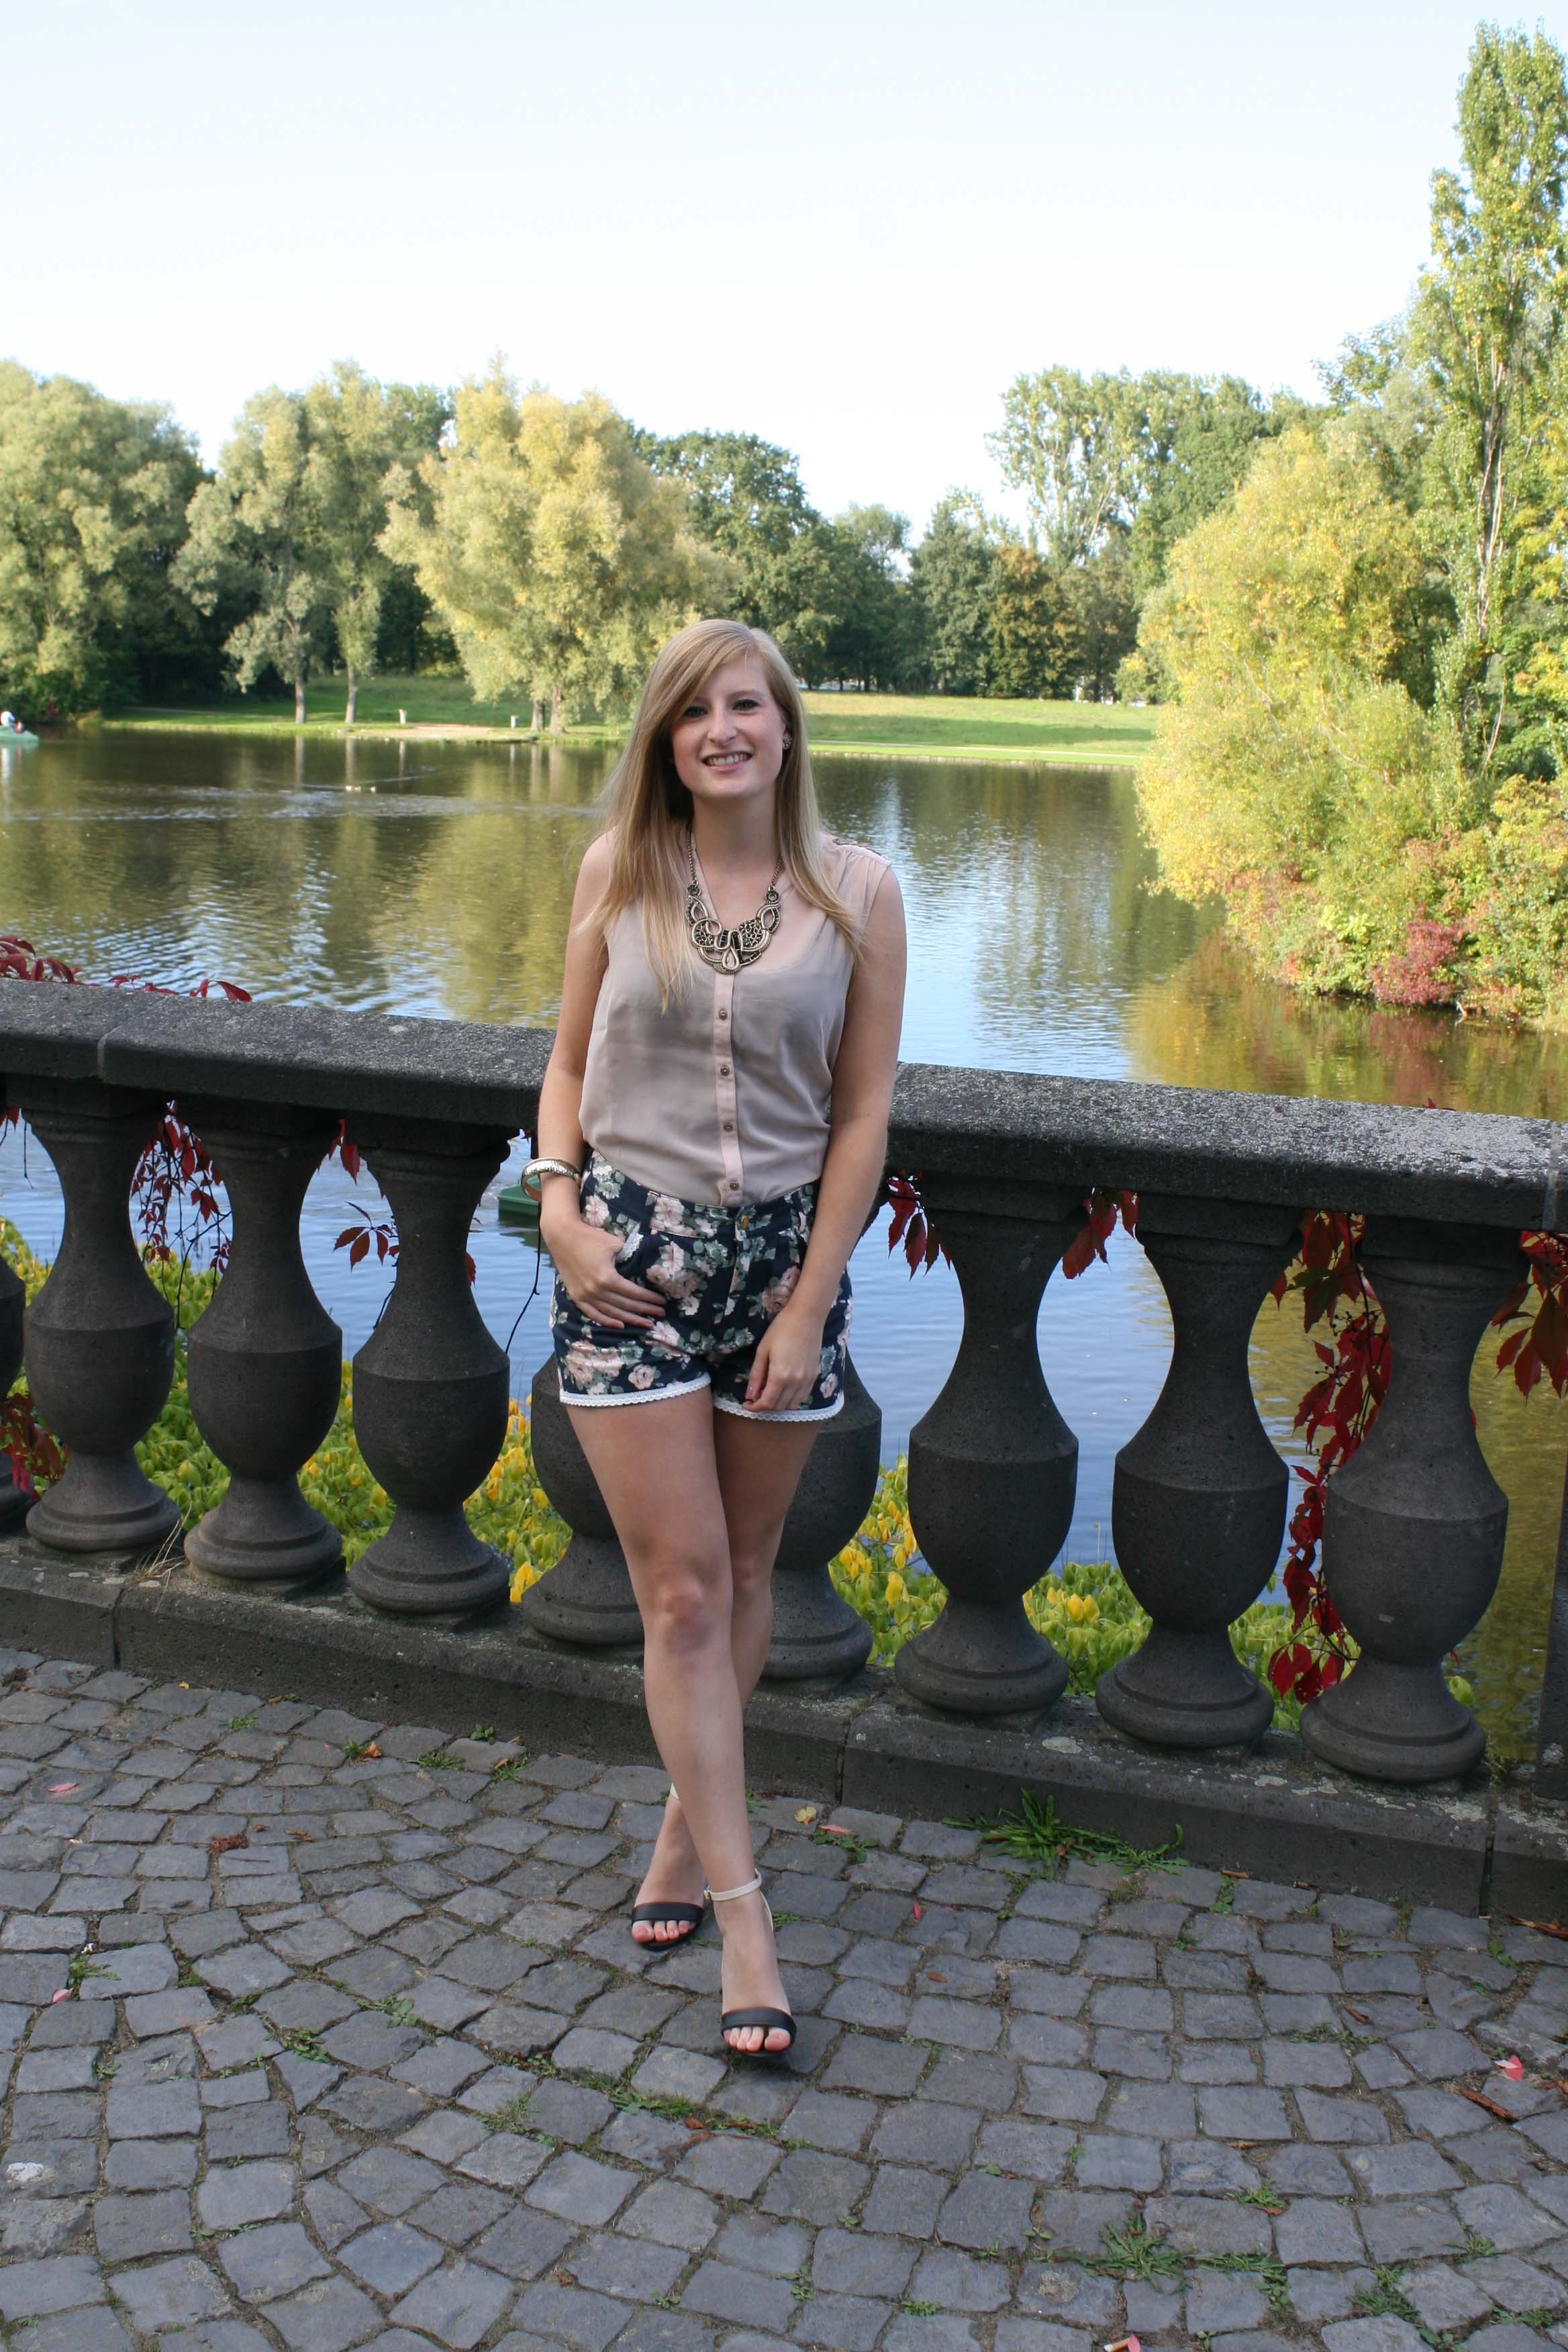 Silky Pink Blouse Rosa Bluse Statementkette Gold Blümchen Shorts ros Heels Rheinaue Bonn Modeblog Outfit 5